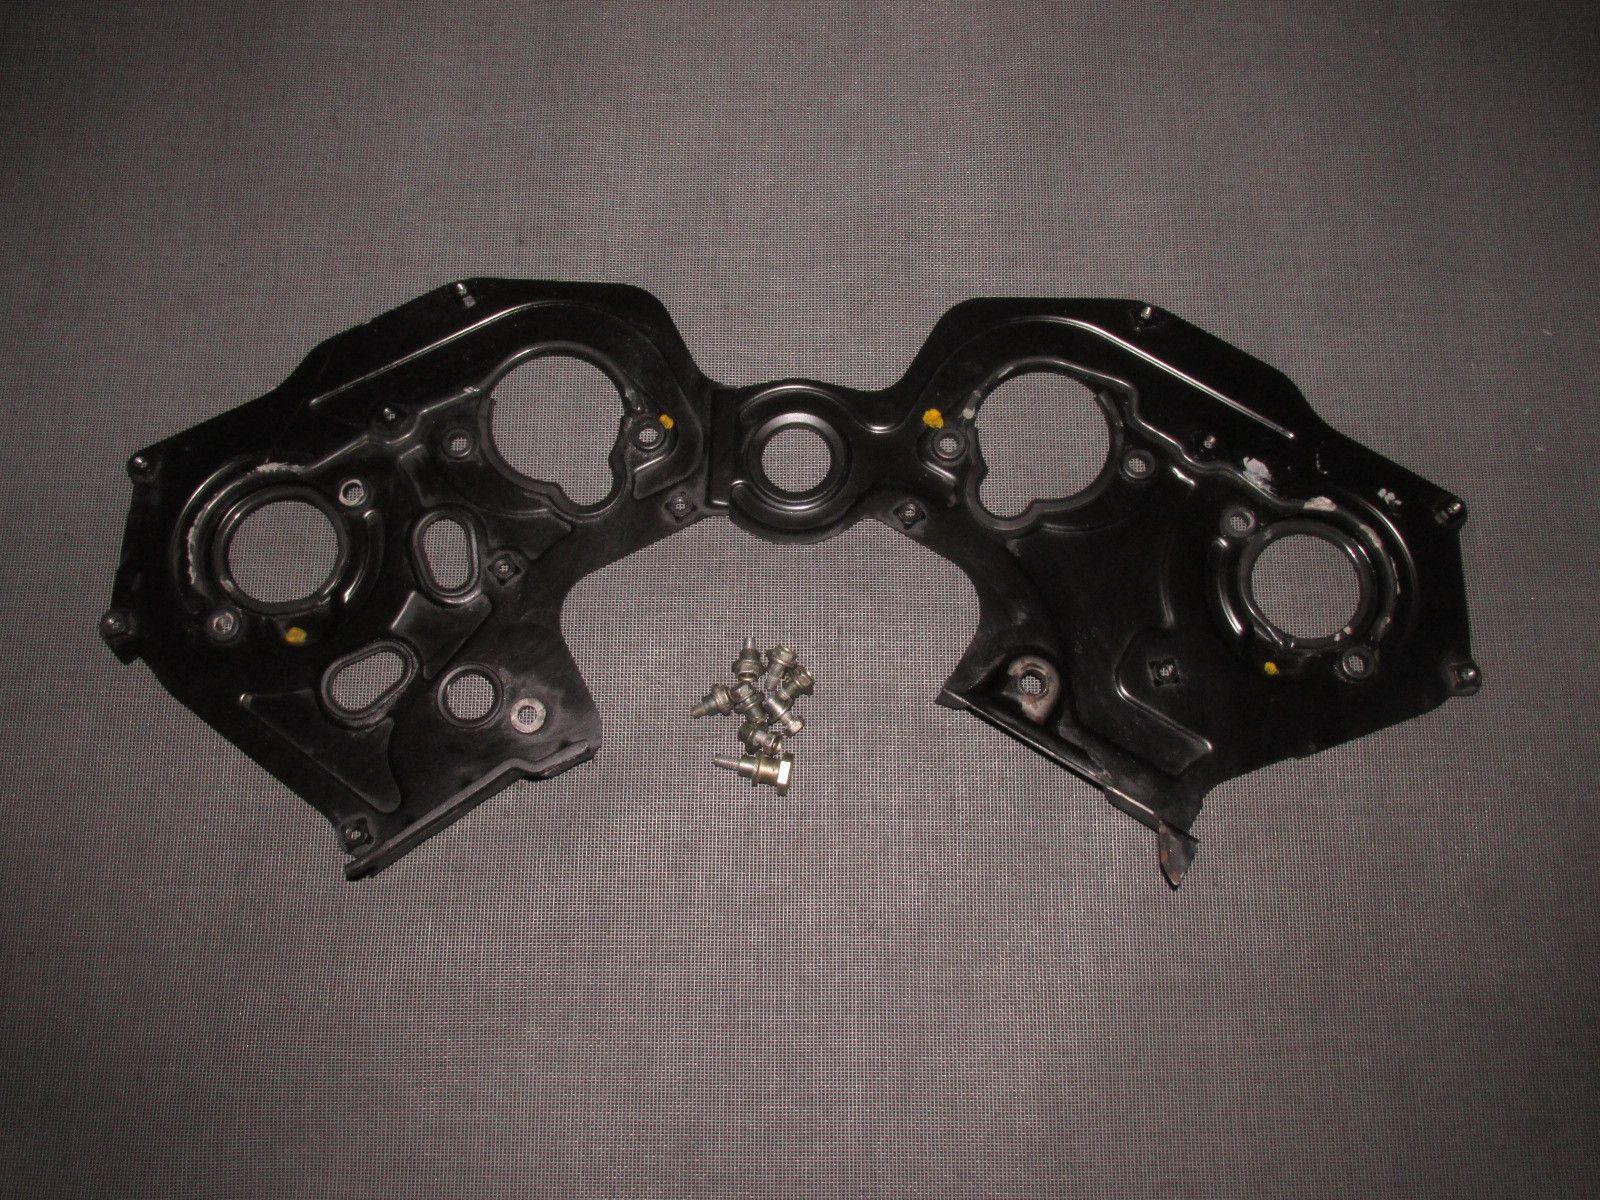 90 91 92 93 94 95 96 nissan 300zx oem cam gear rear plate cover set rh pinterest com